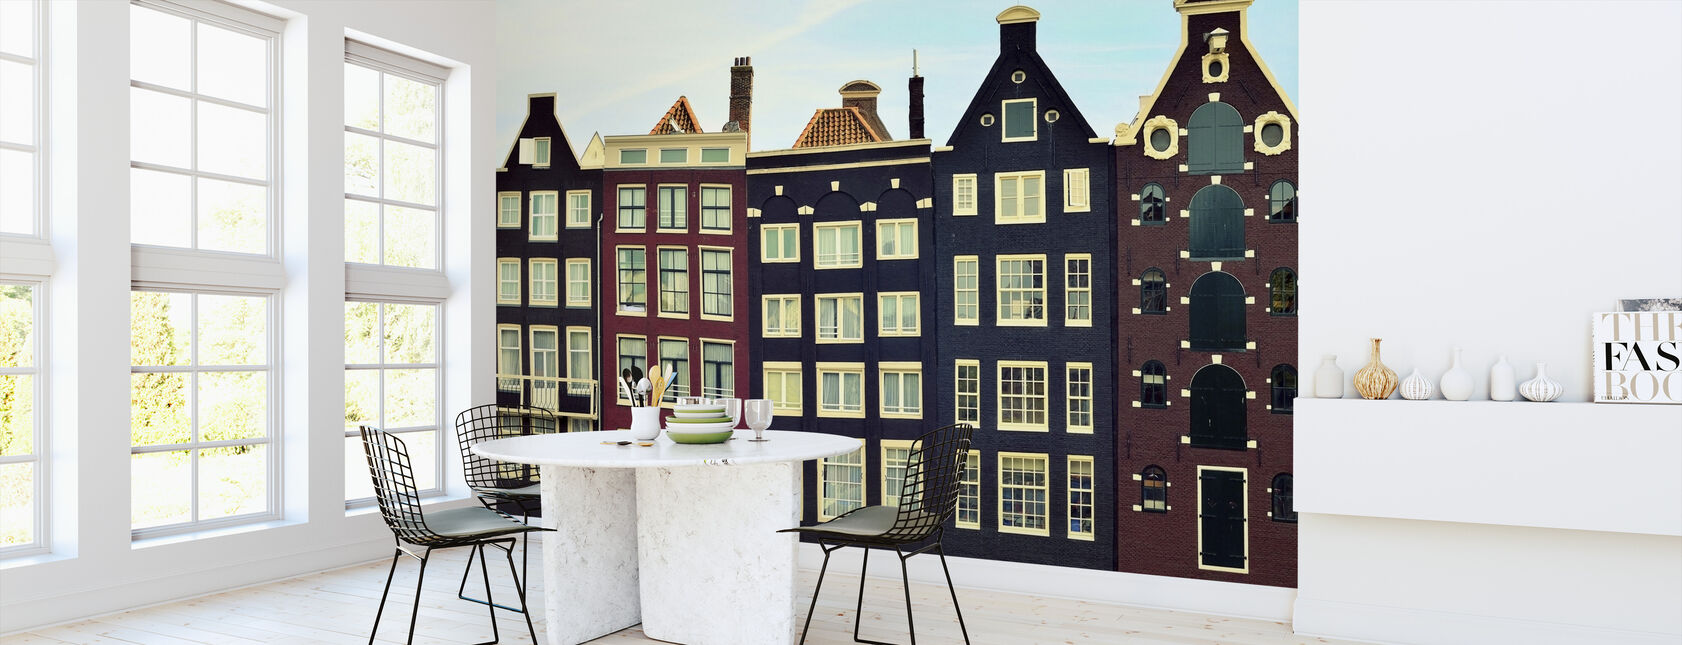 Amsterdamse Huizen - Behang - Keuken